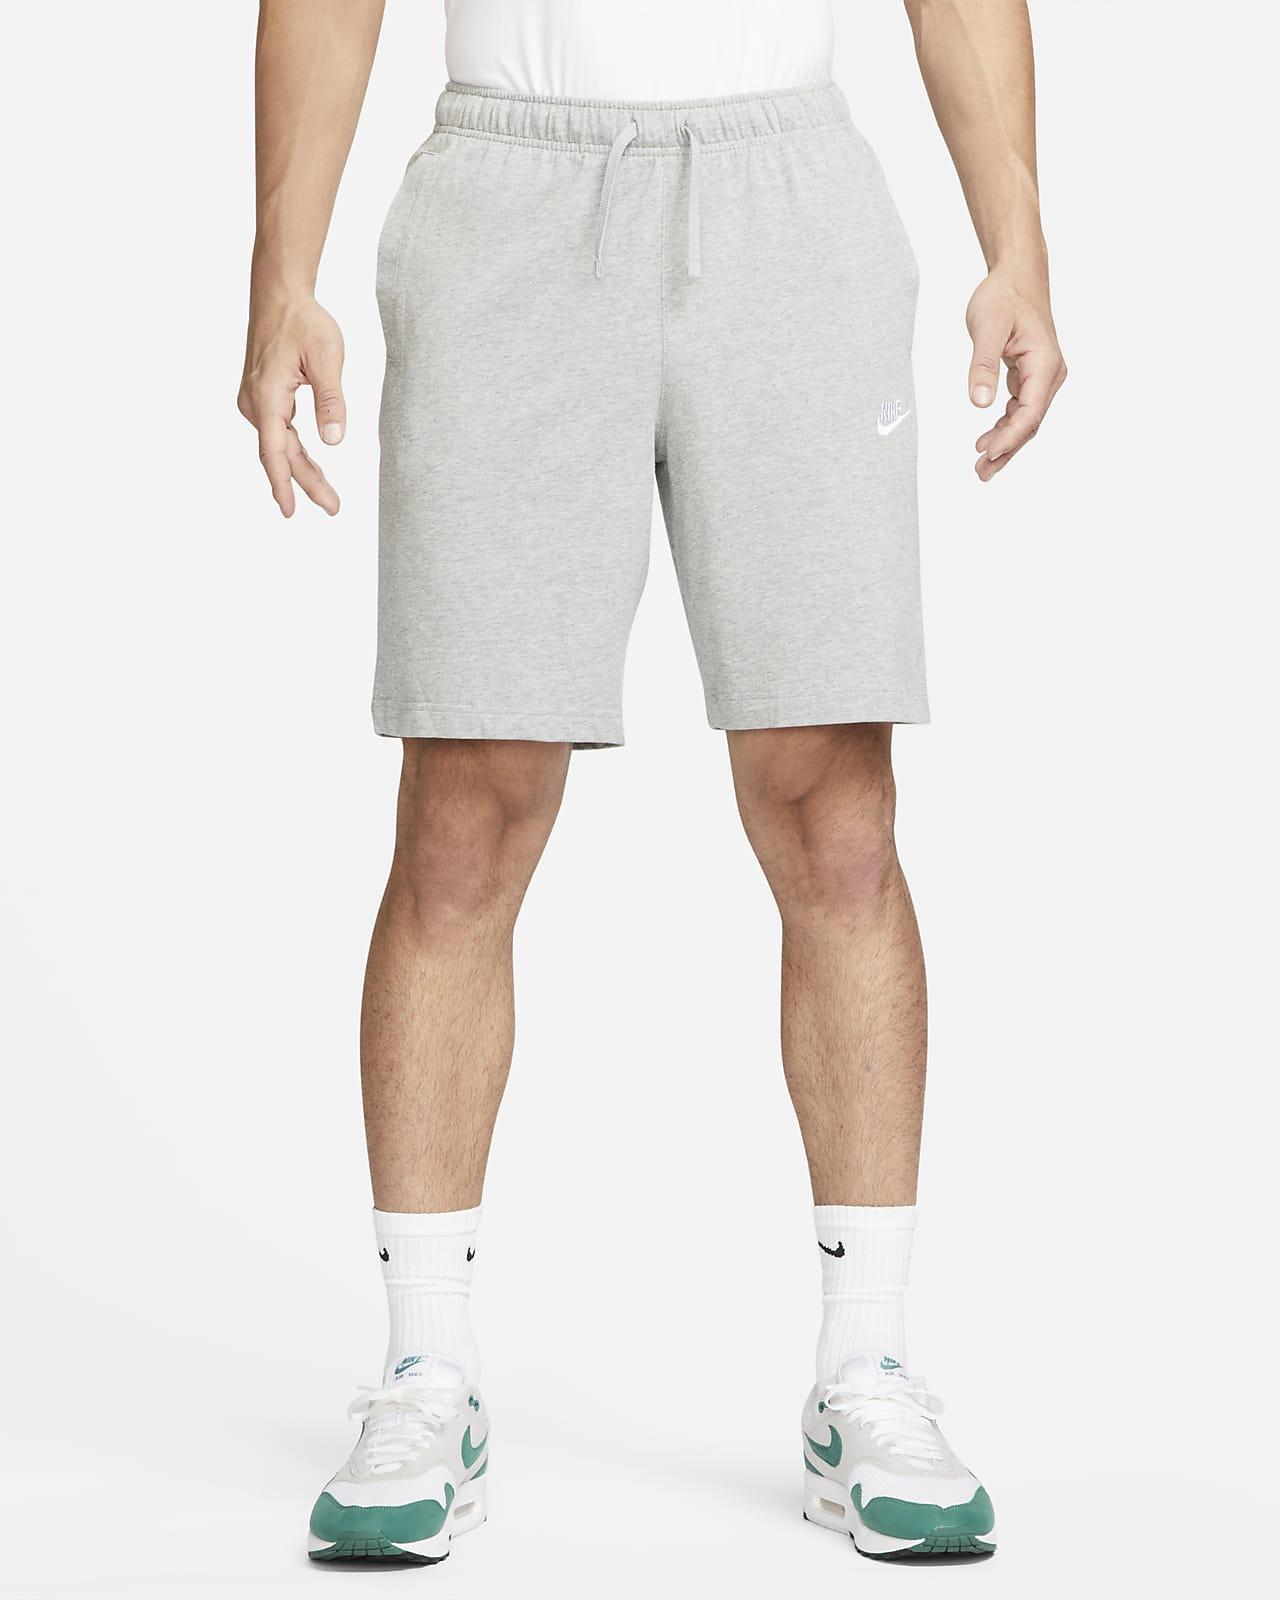 Shorts Nike Sportswear Club för män